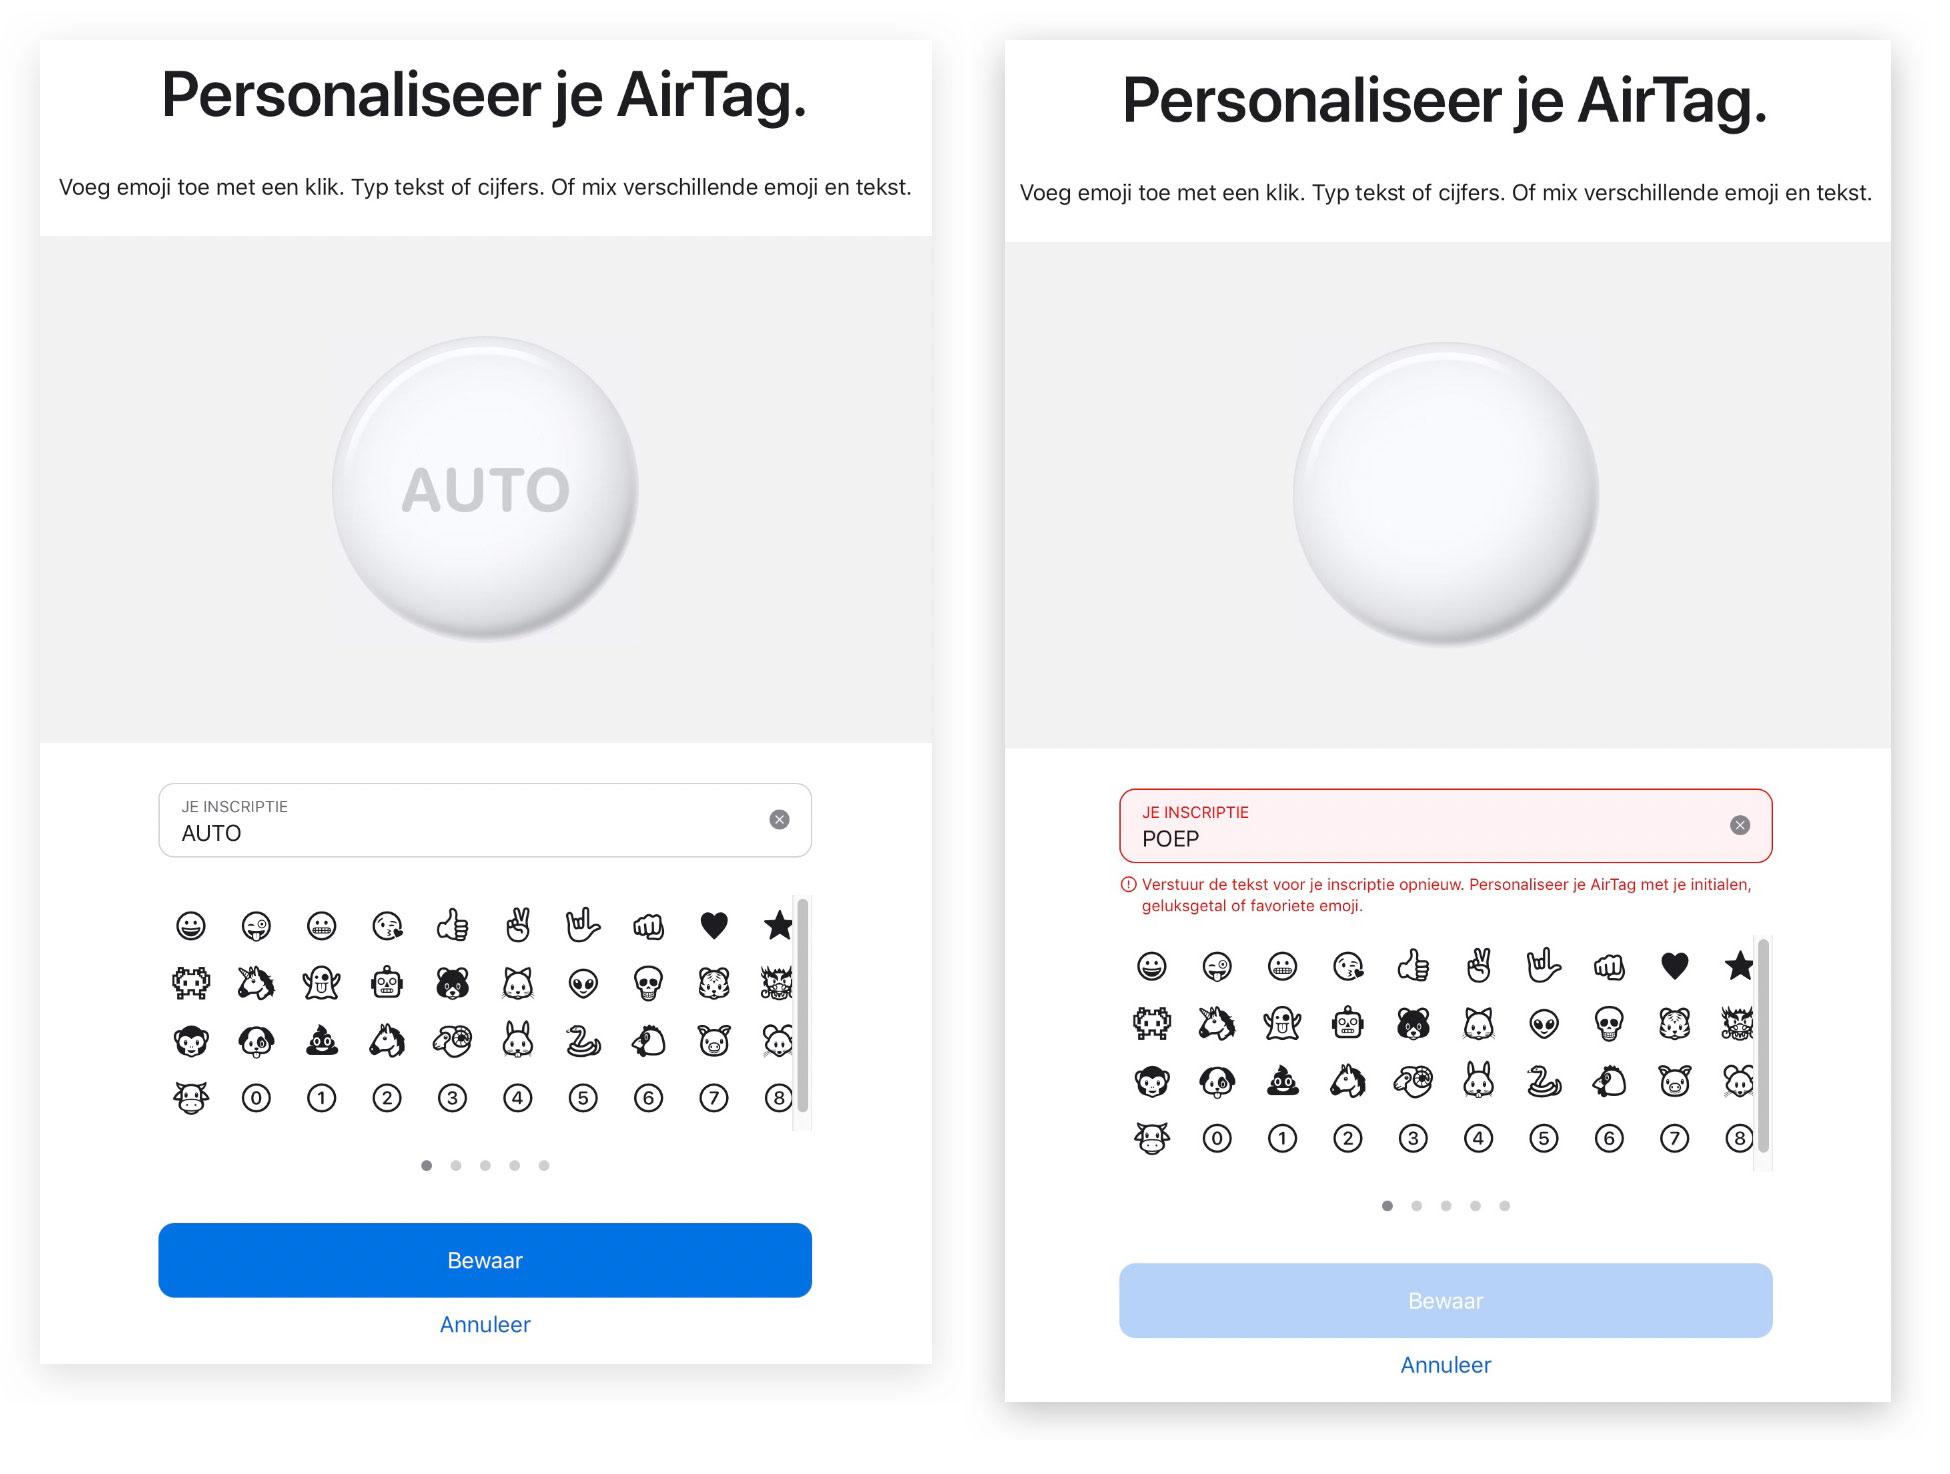 https://www.macfreak.nl/modules/news/images/zArt.PersonaliseerJeAirTagsControverse.jpg